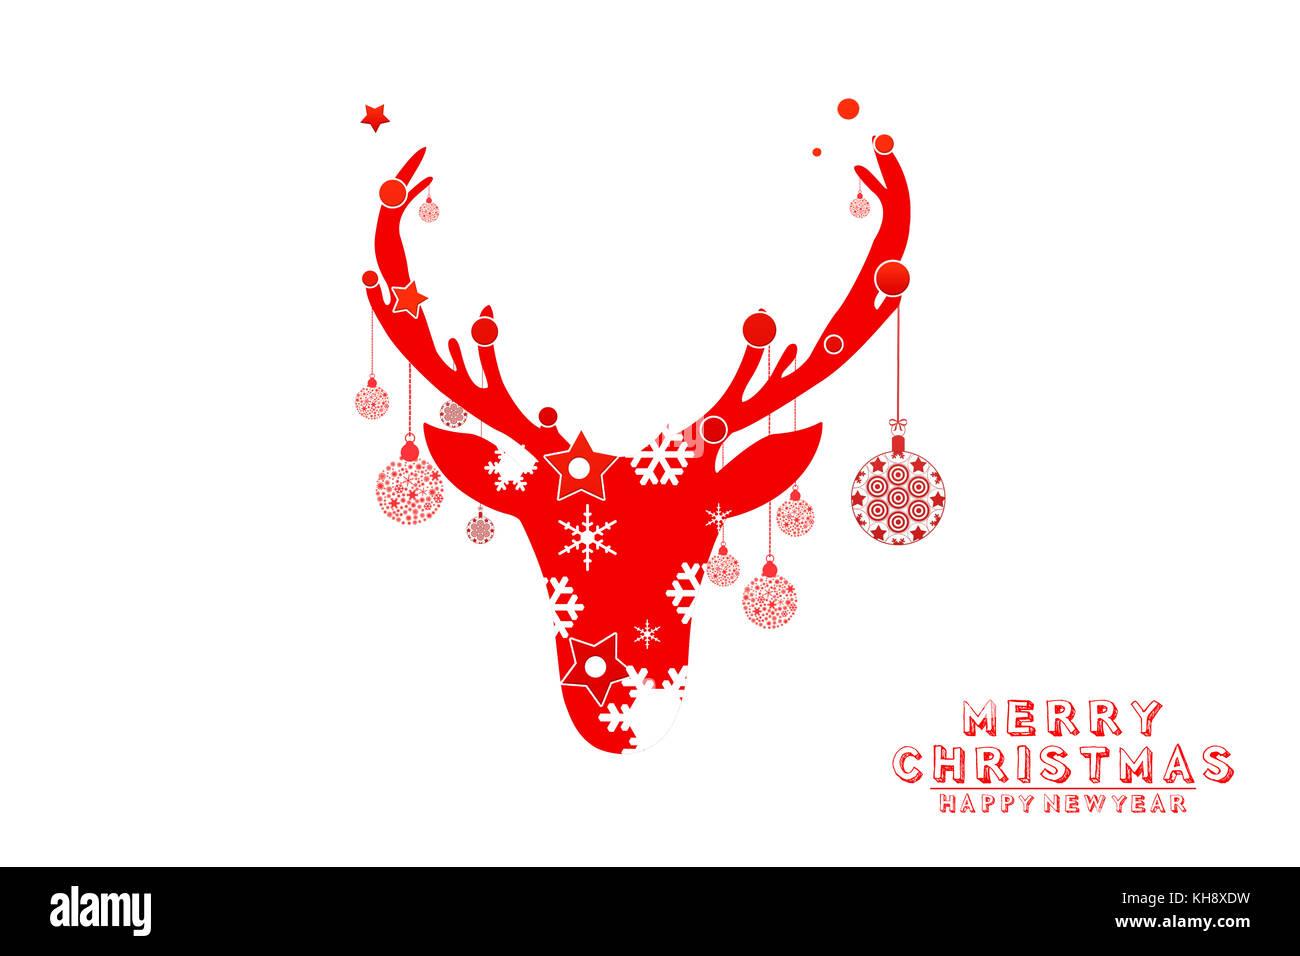 Text Icon Merry Christmas Design Imágenes De Stock & Text Icon Merry ...